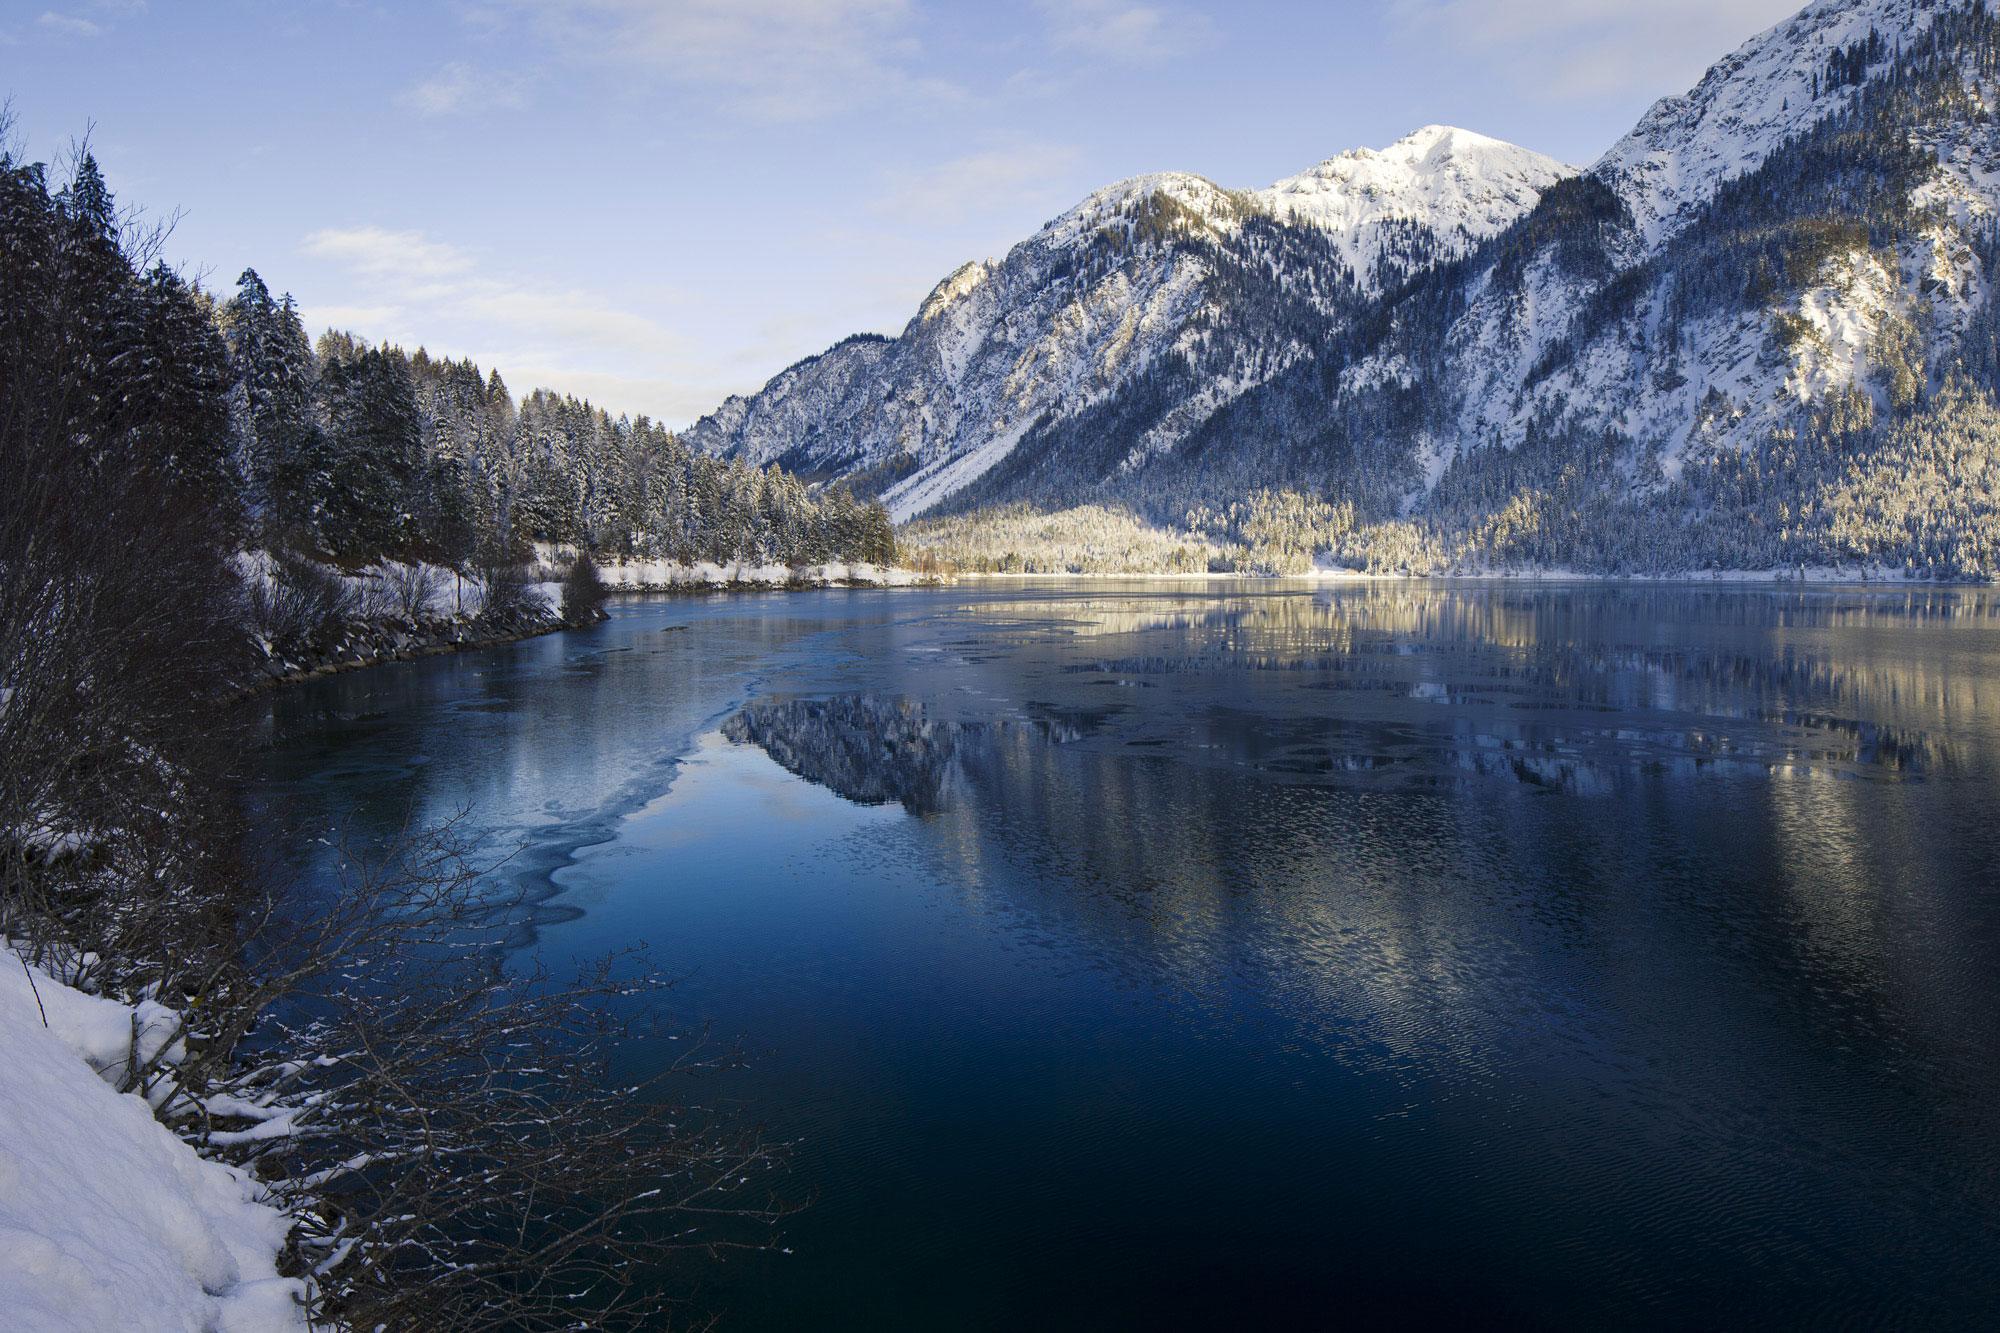 Winterstimmung am Plansee © Robert Eder